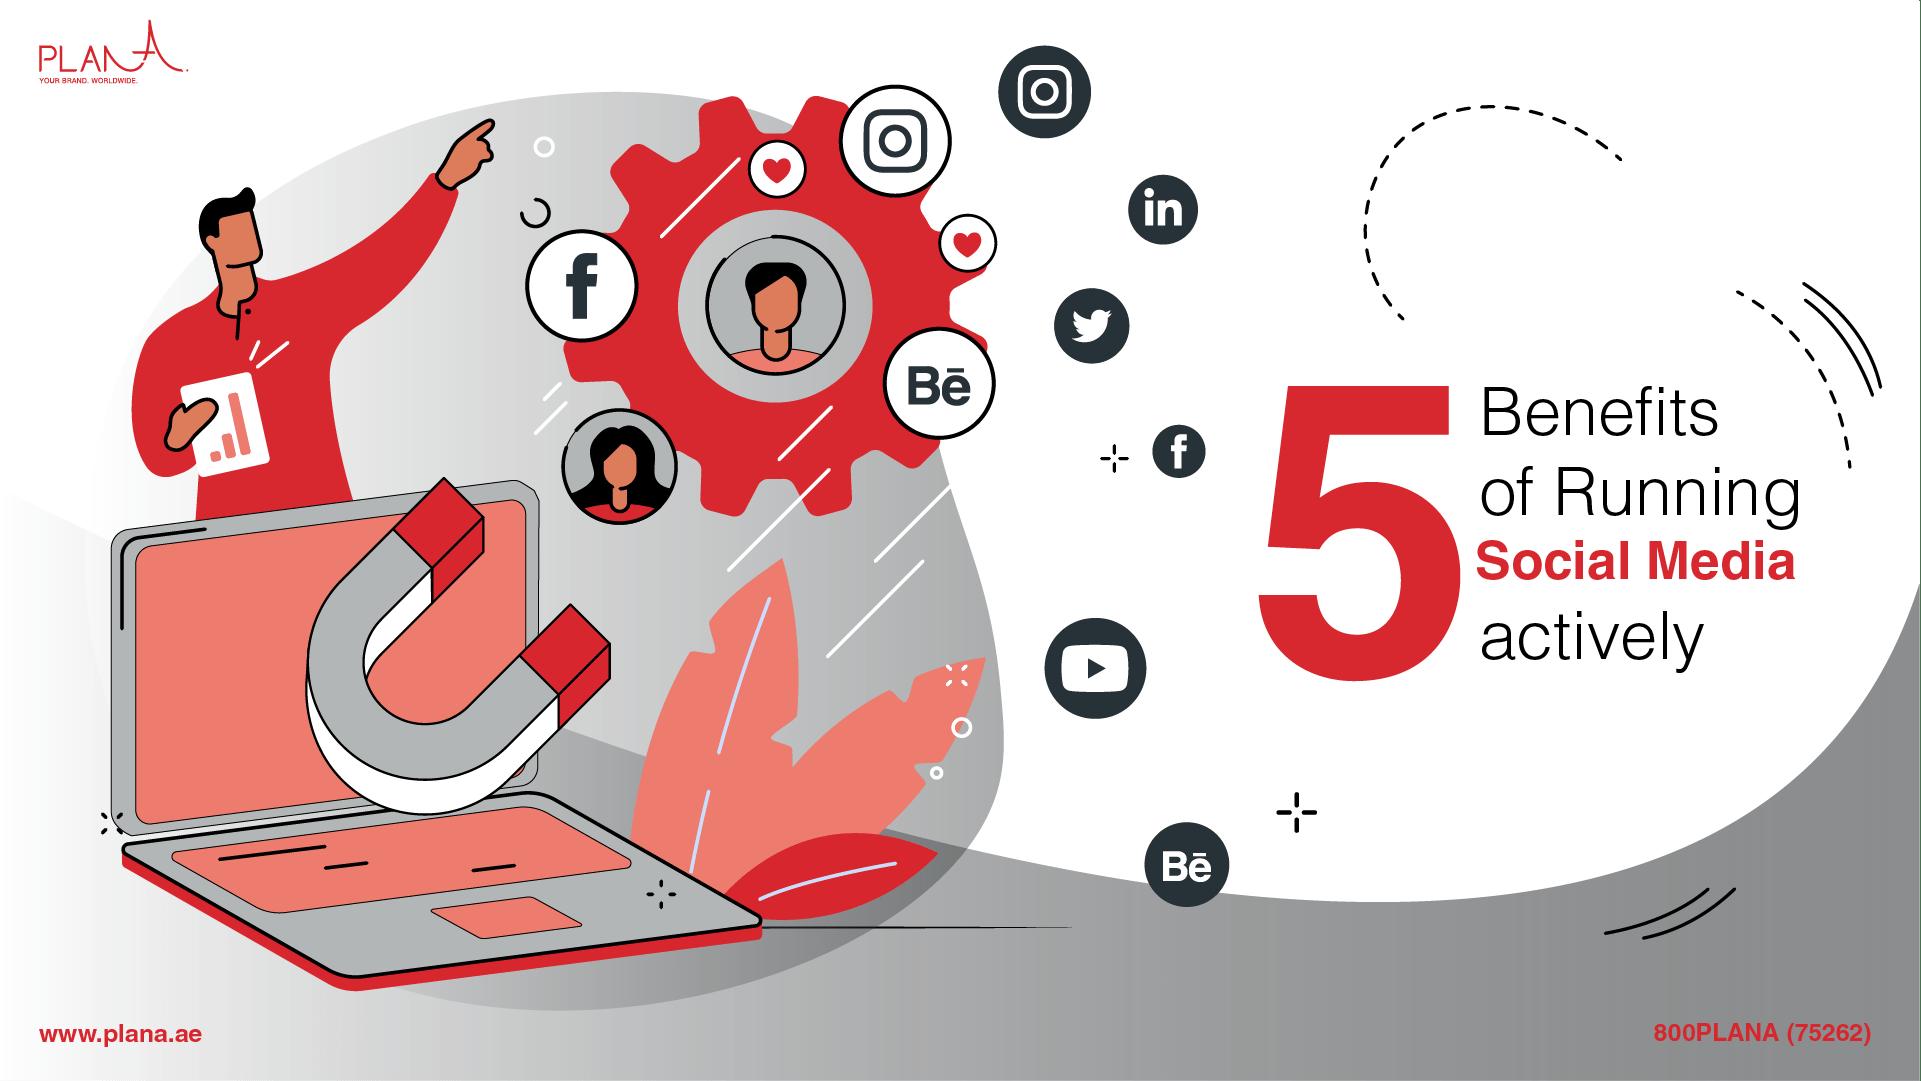 5 Benefits of Running Social Media Actively